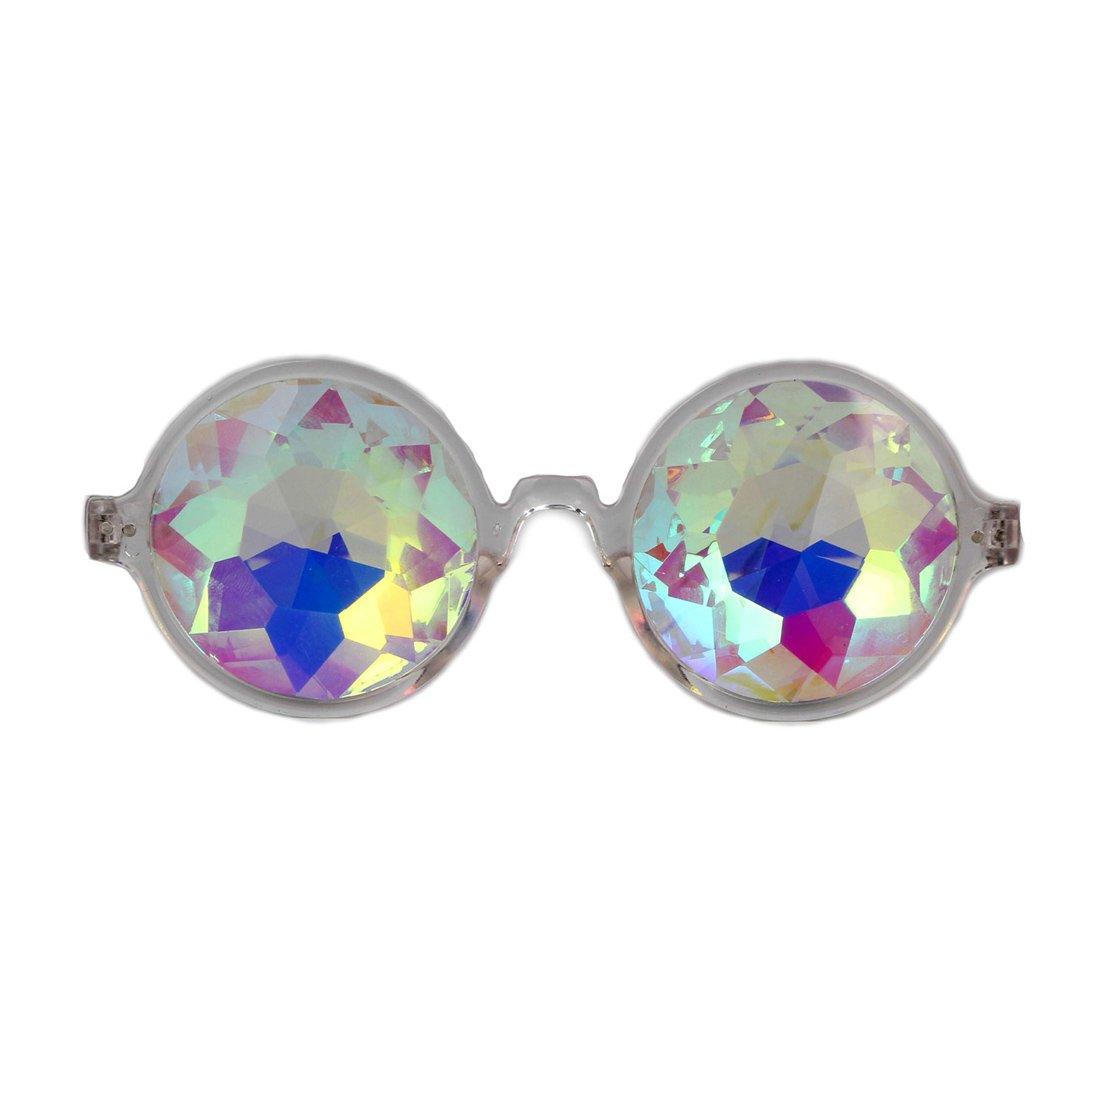 FIRSTLIKE Festive carnival kaleidoscope glasses - rainbow prism diffraction crystal lens